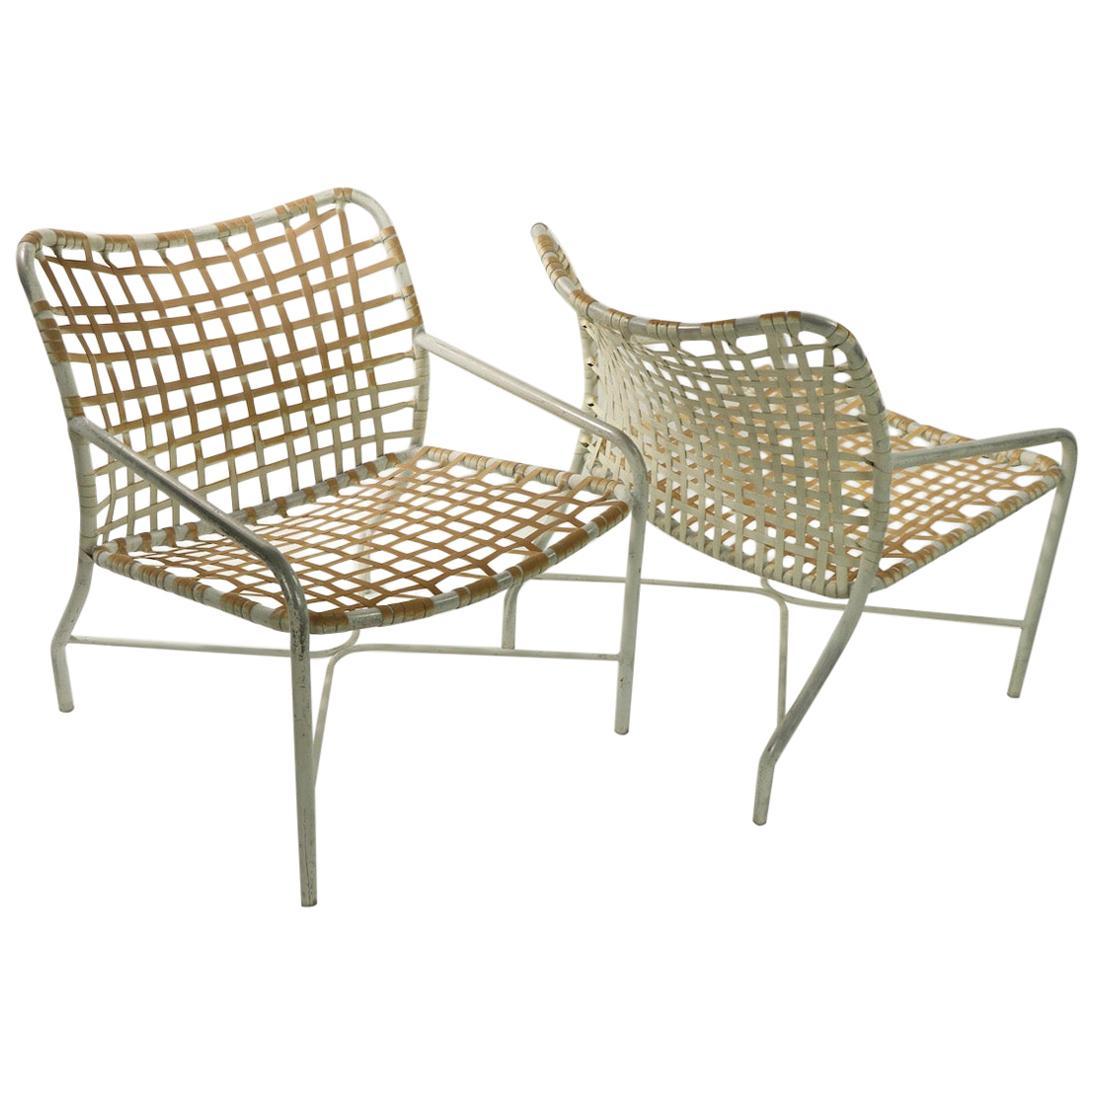 pr lounge chairs by tadao inouye for brown jordan